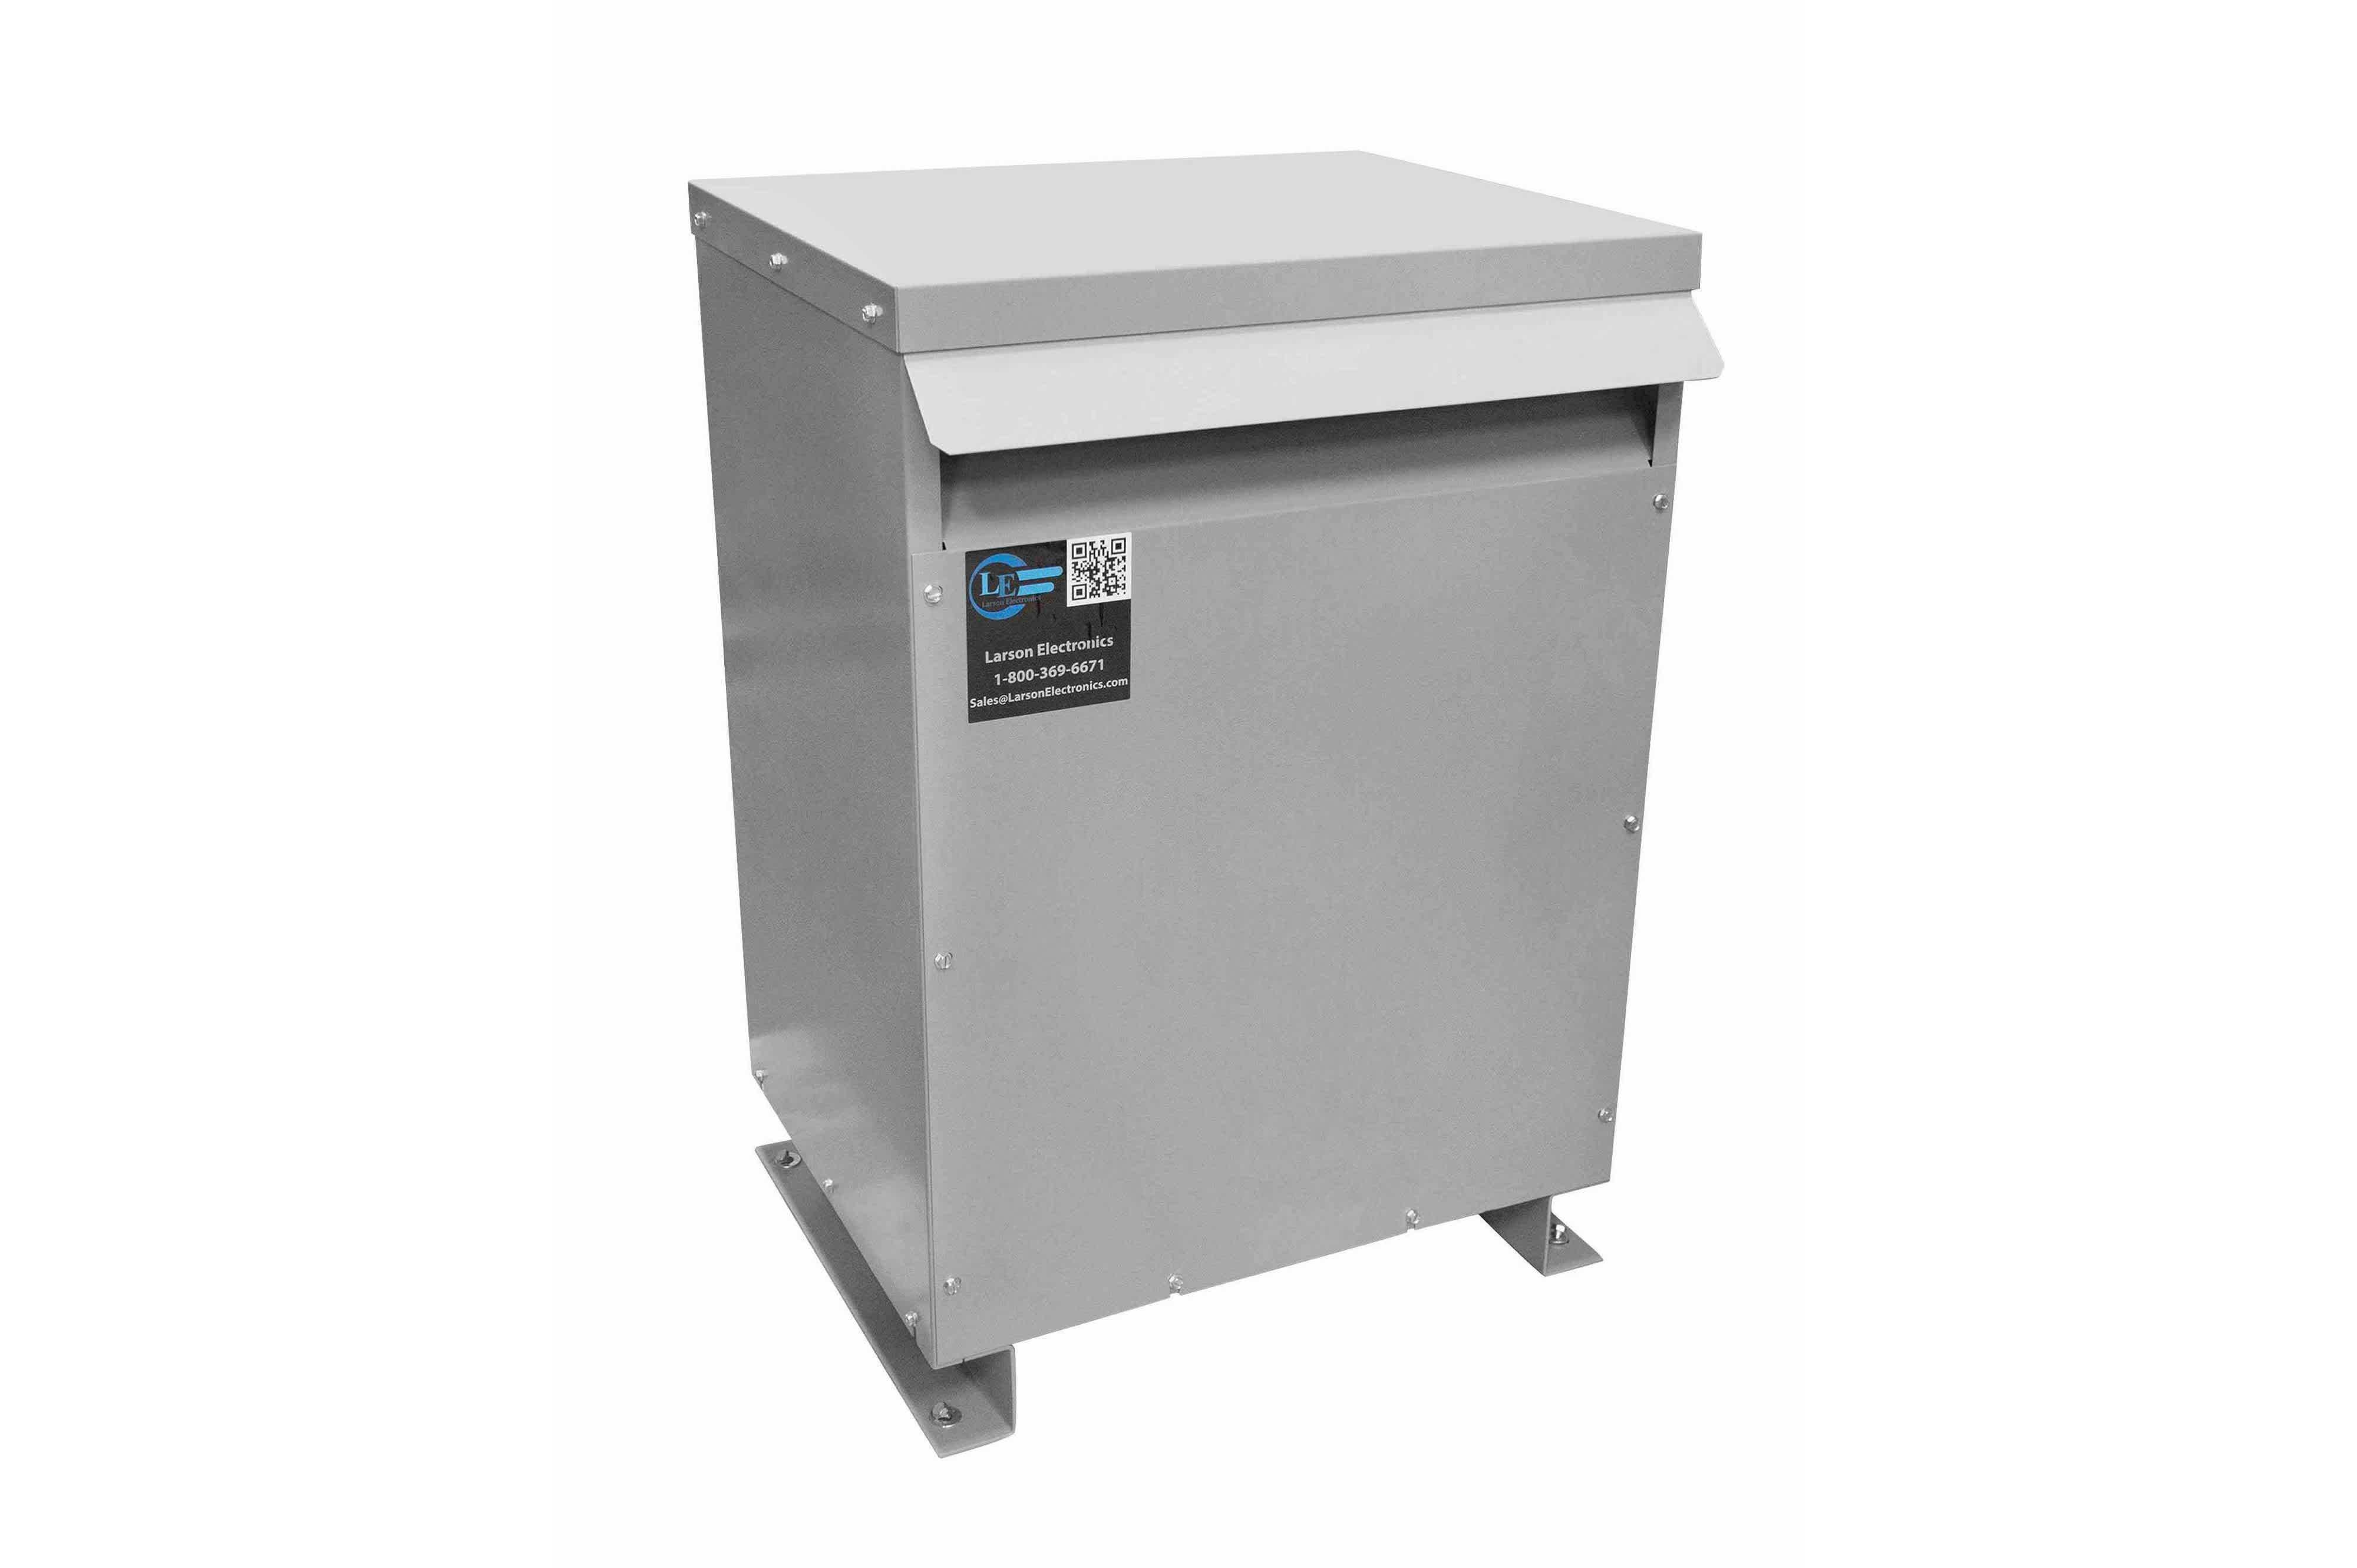 700 kVA 3PH DOE Transformer, 380V Delta Primary, 600Y/347 Wye-N Secondary, N3R, Ventilated, 60 Hz